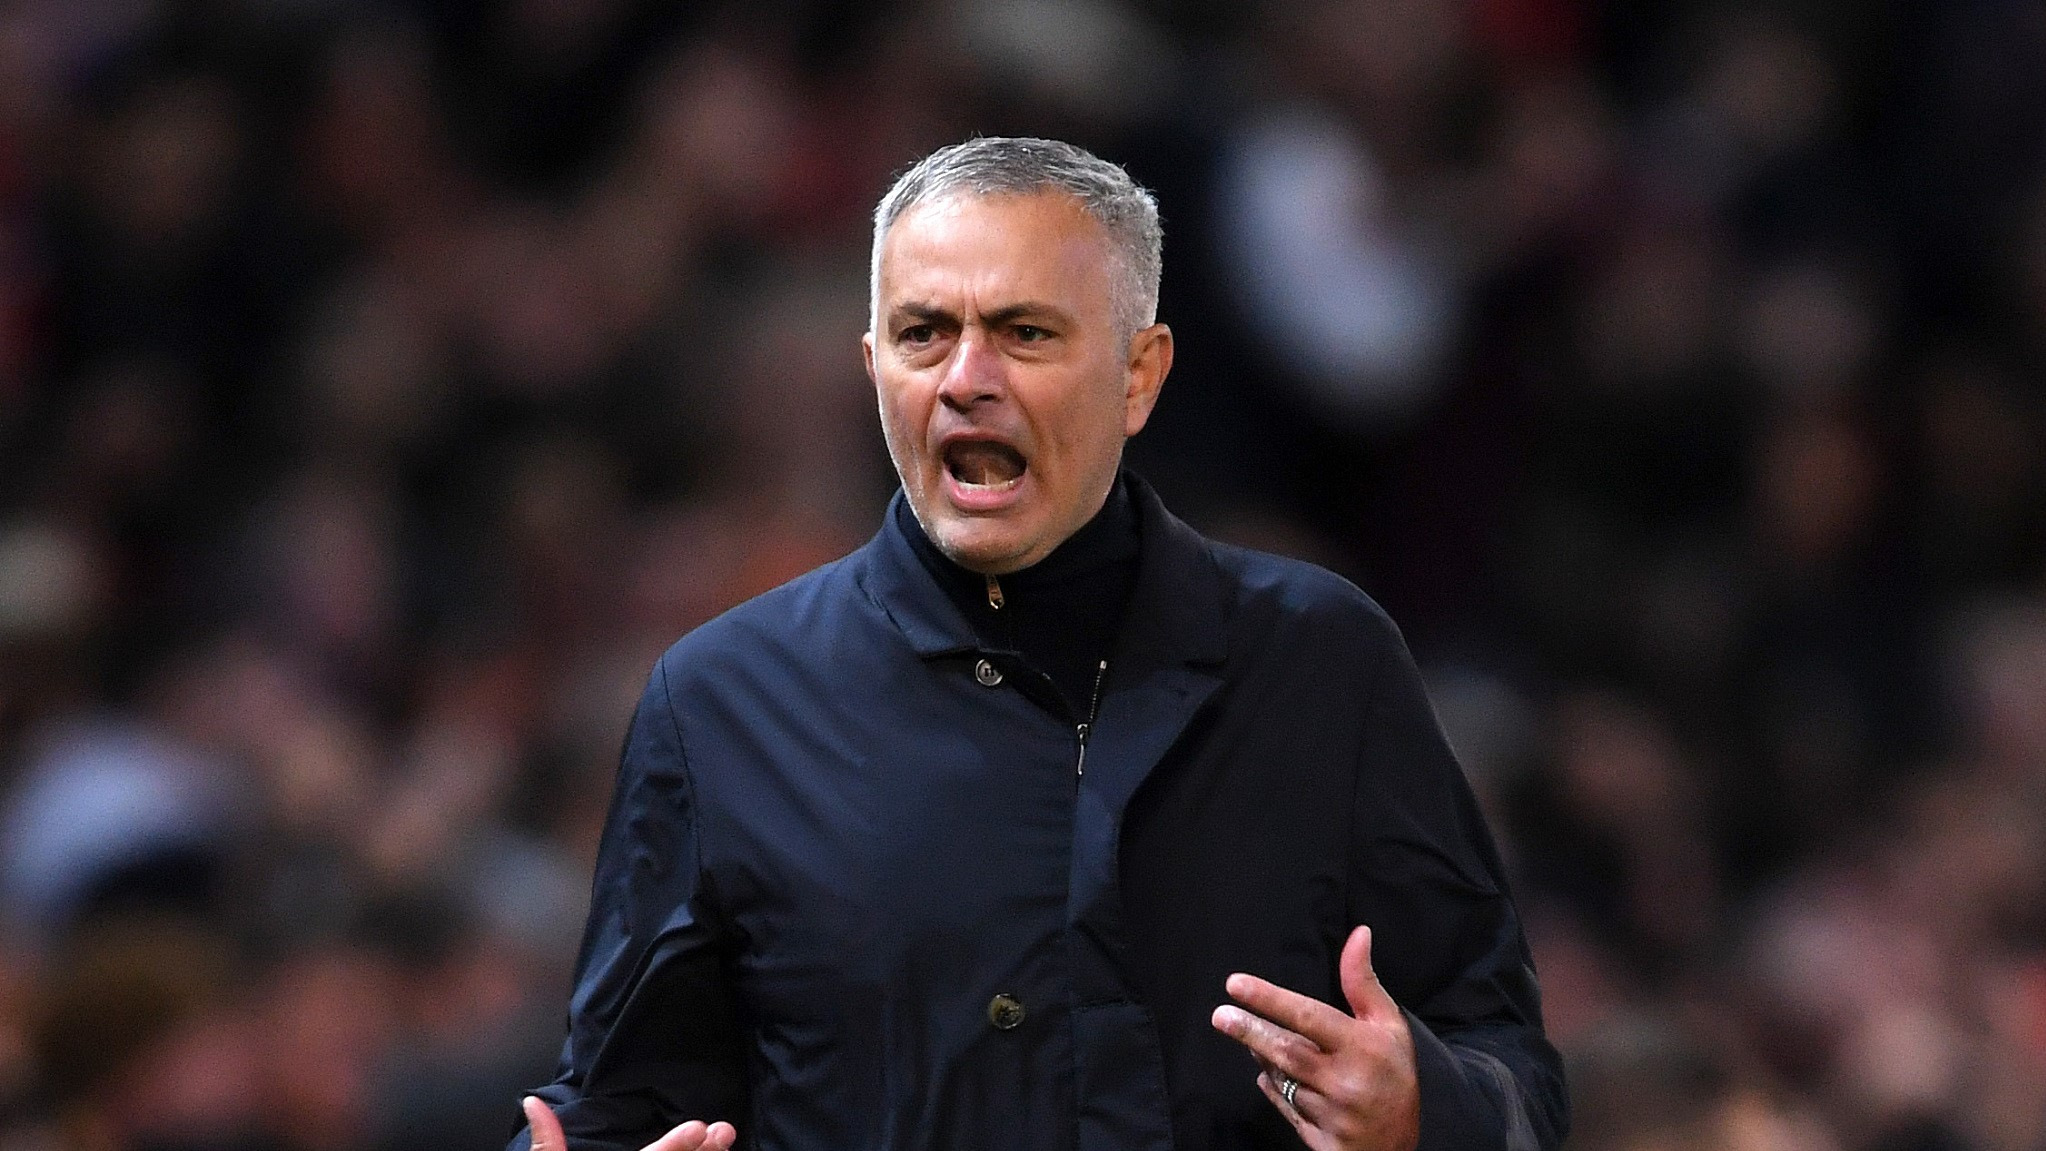 Jose Mourinho to hunt for mole inside Manchester United